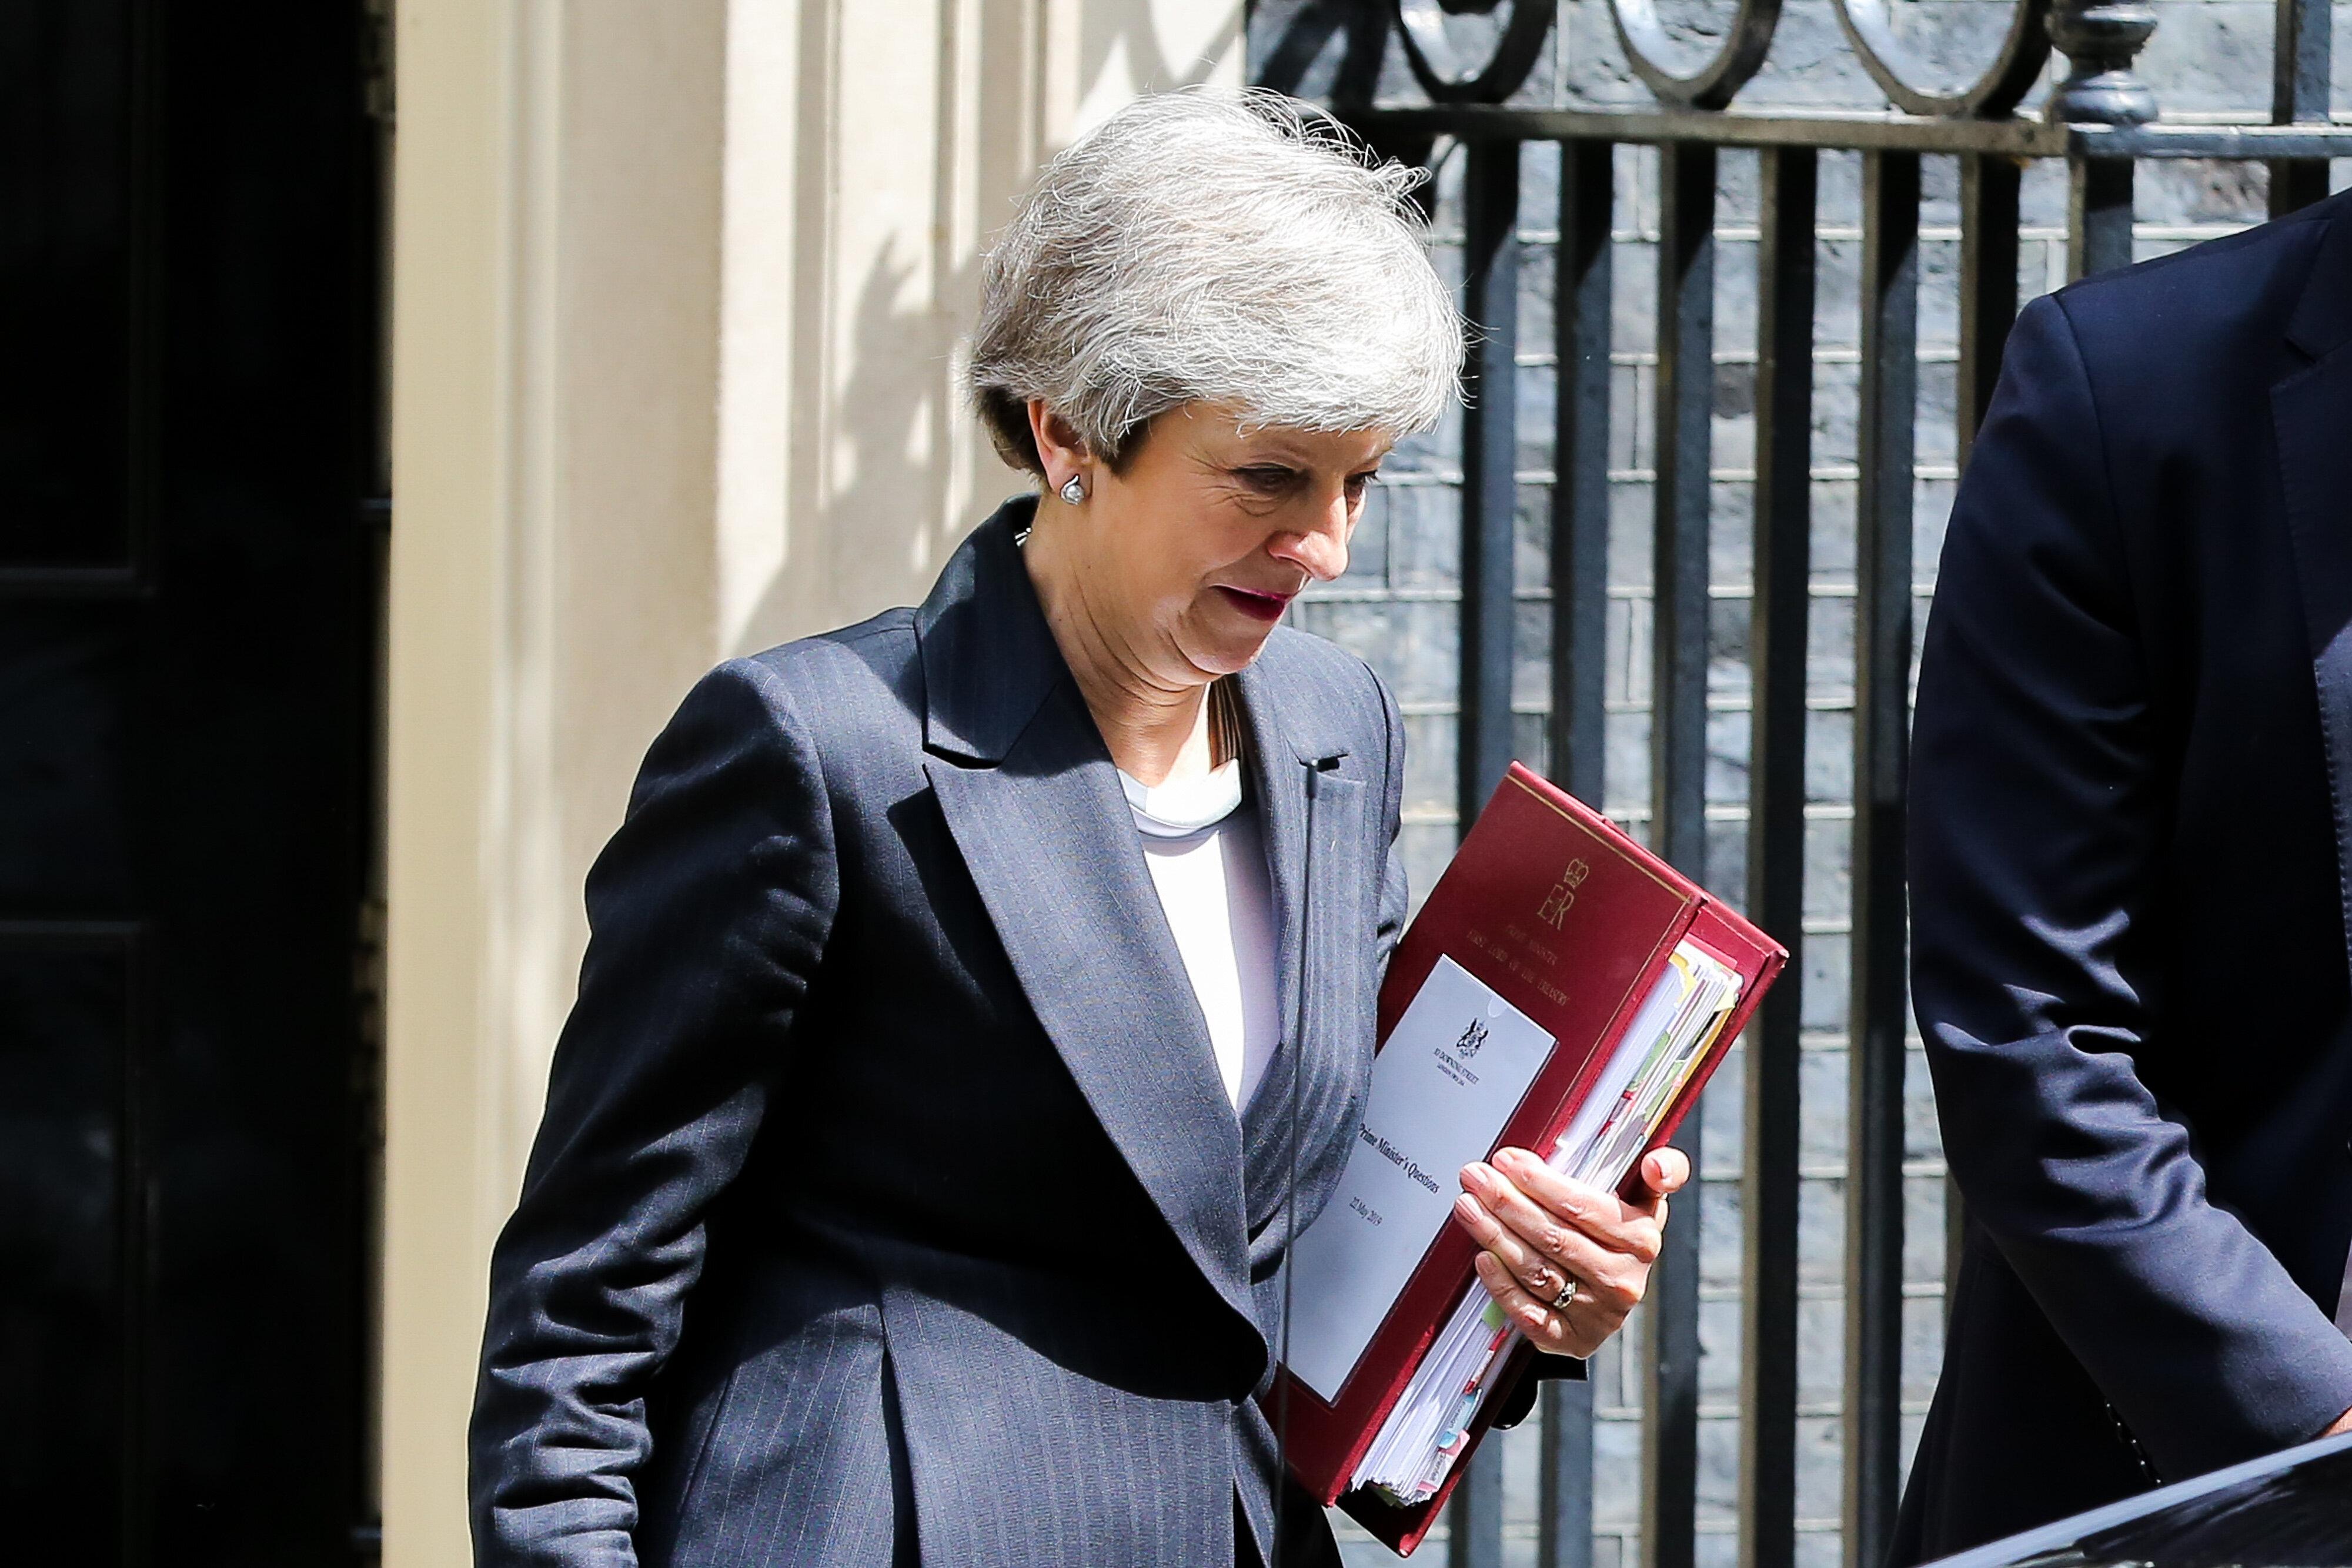 Brexit: Η Μέι ανακοινώνει τις επόμενες ώρες την ημερομηνία της αποχώρησής